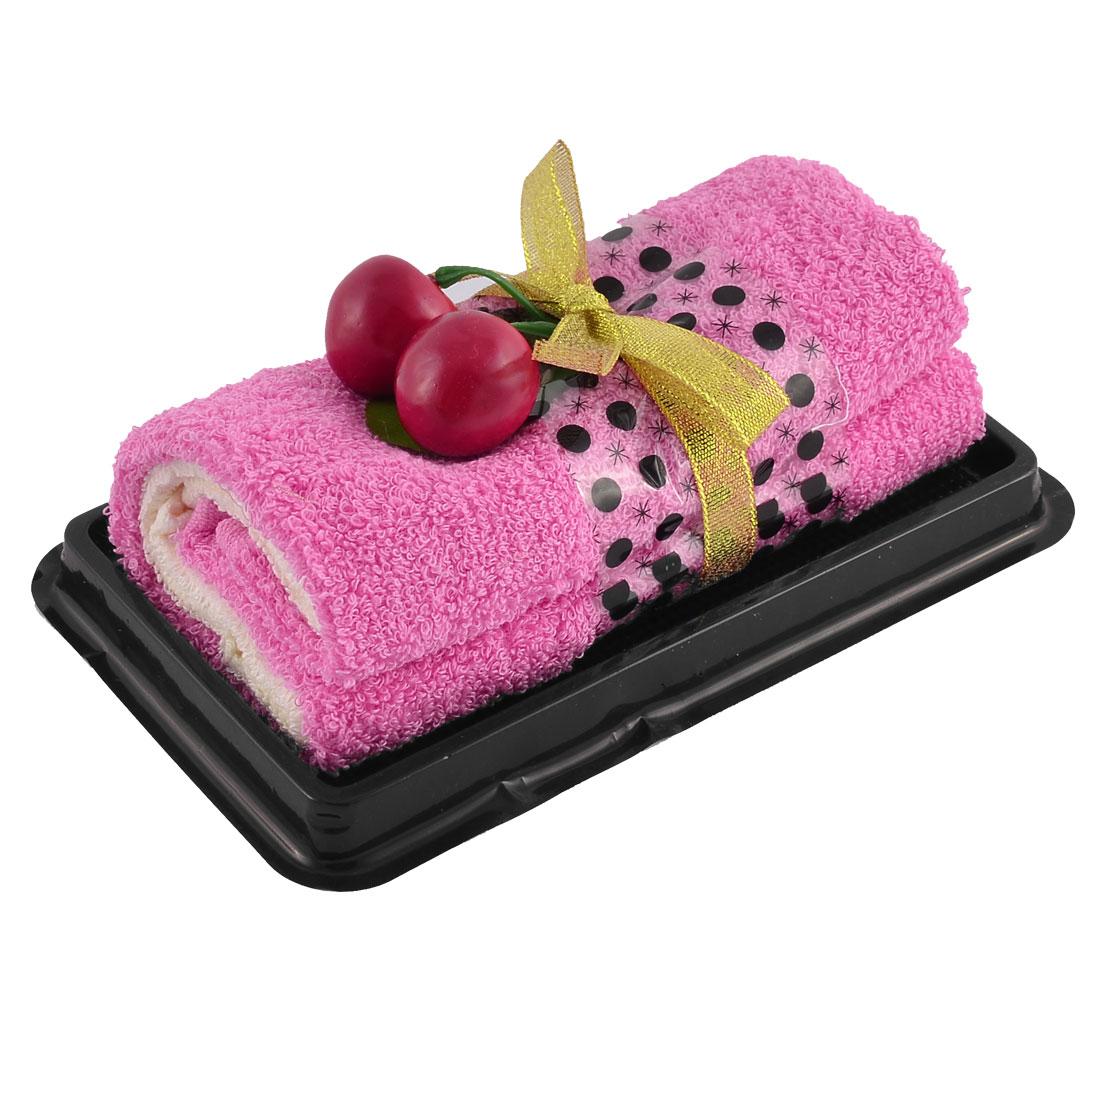 Roll Cake Towel Fake Cherry Decor Detail Washrag Washcloth Facecloth Gift Fuchsia